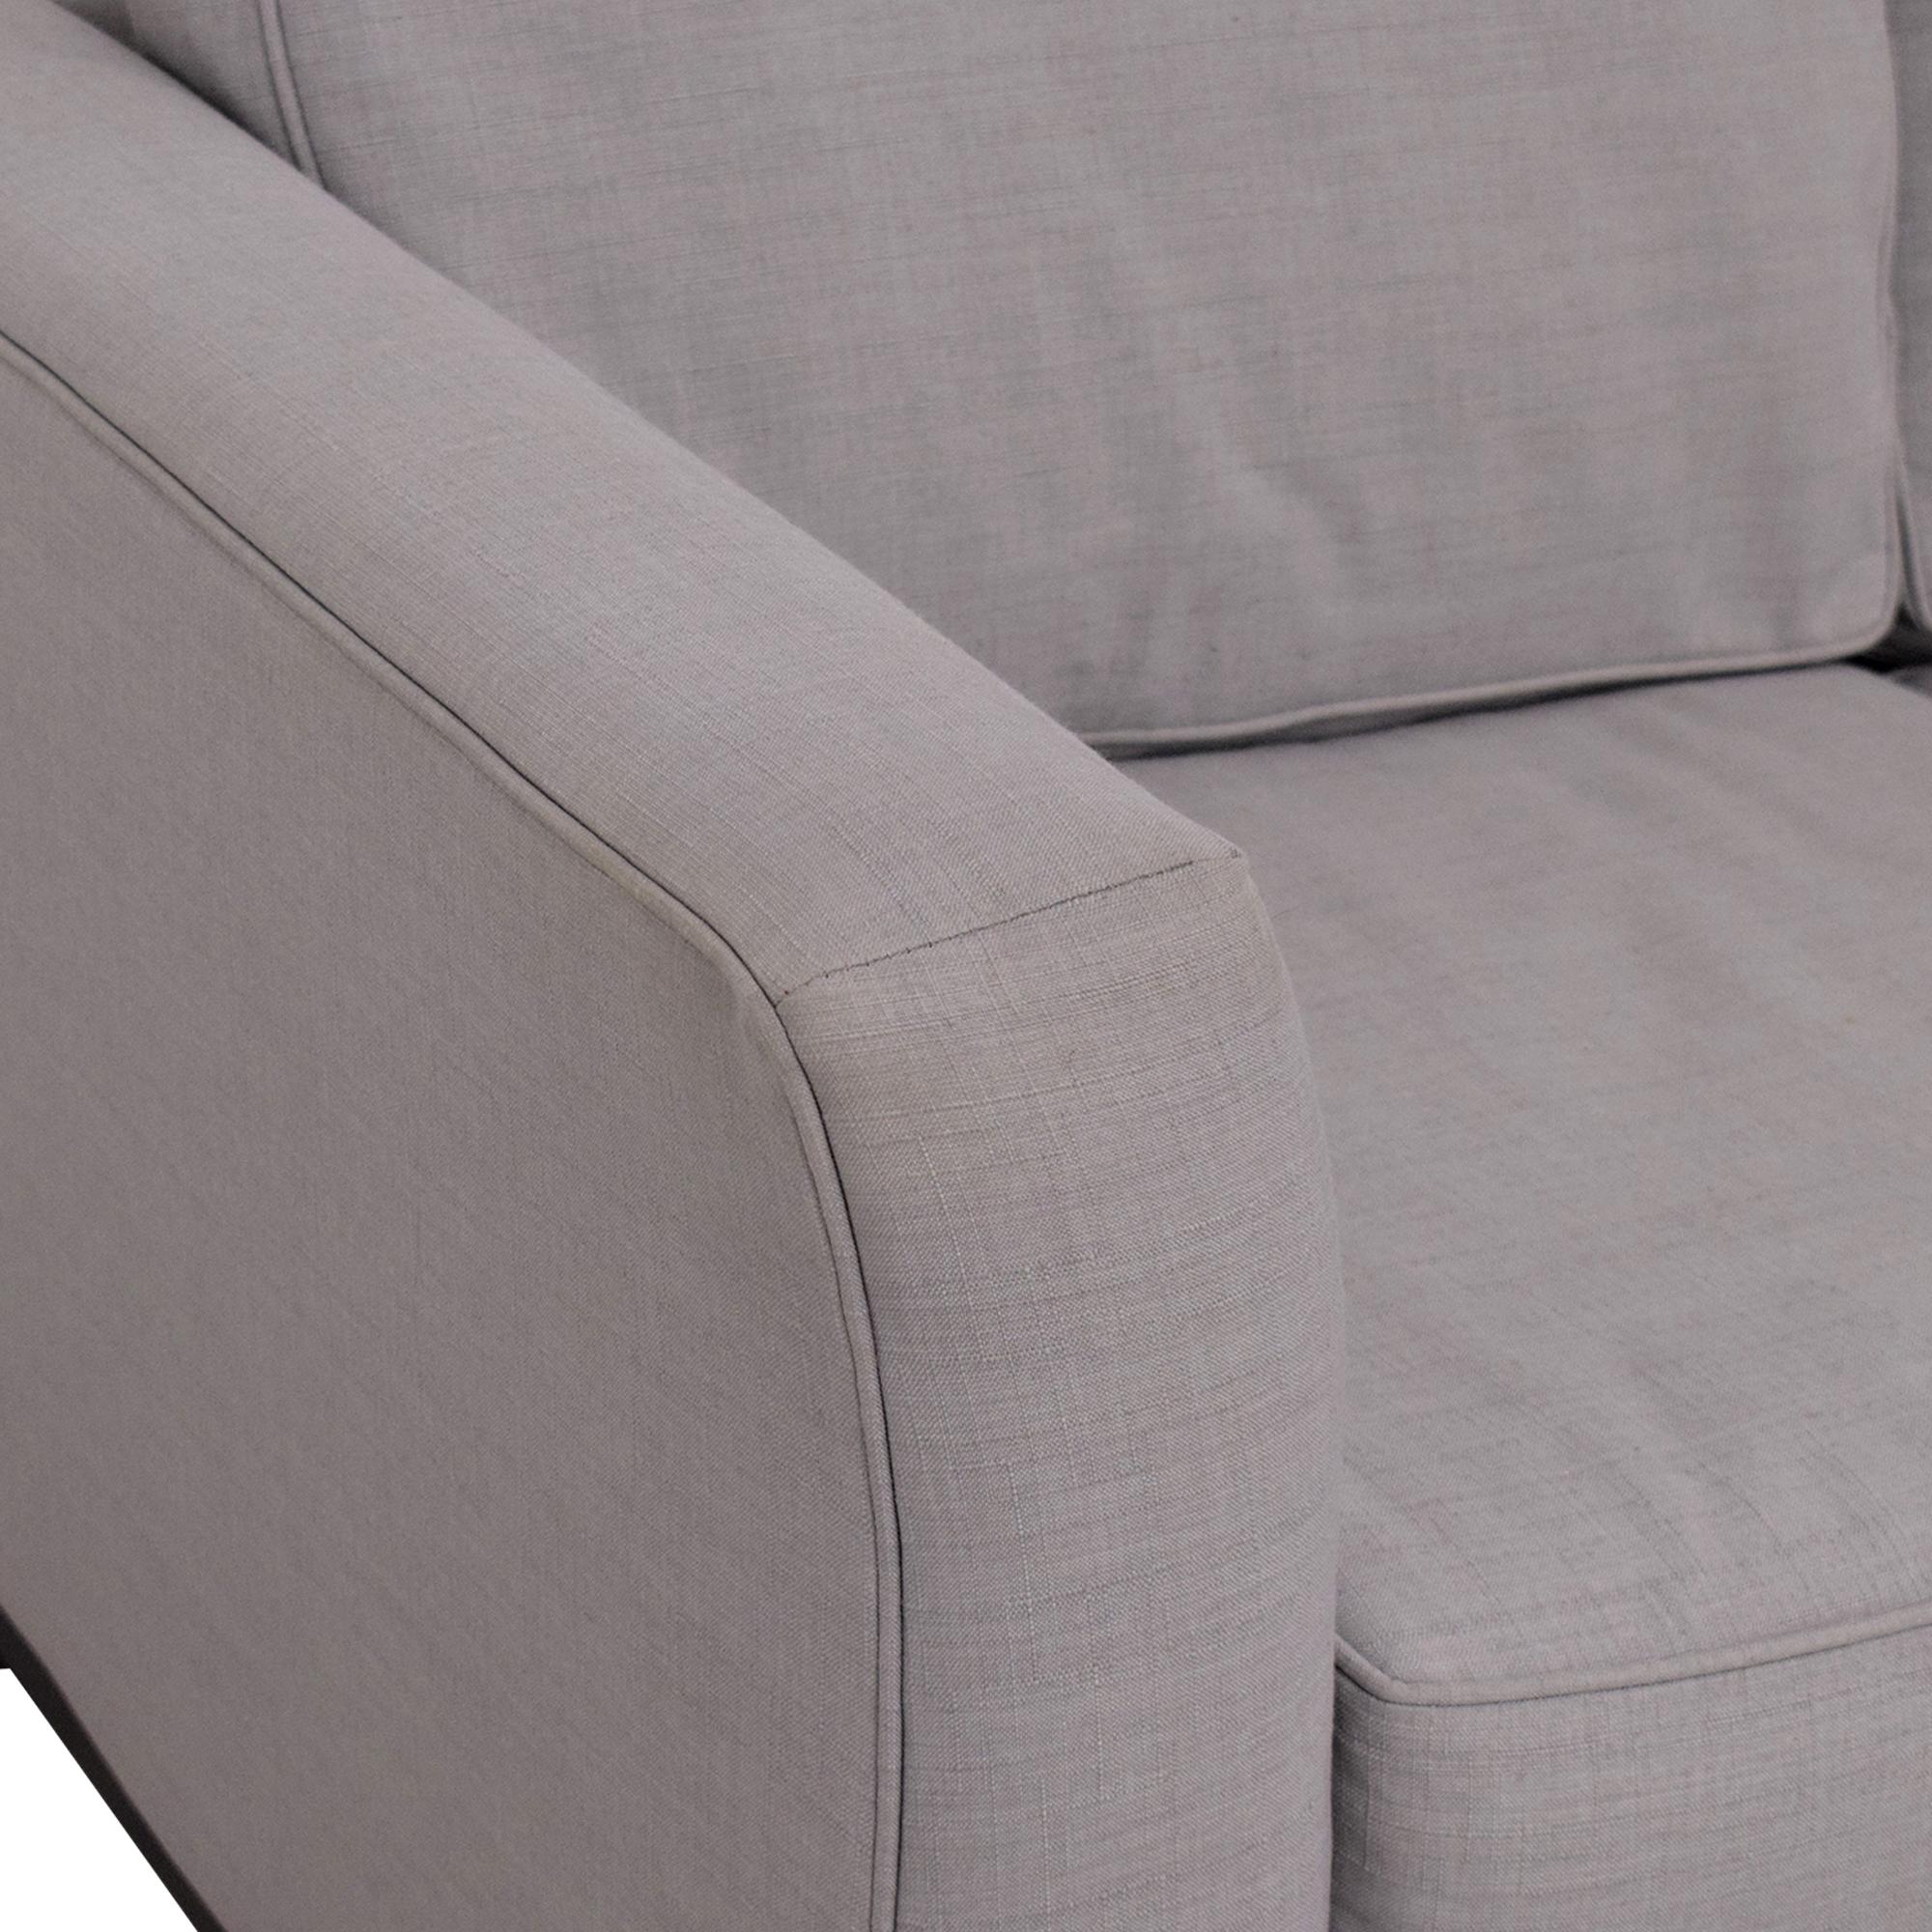 Macy's Macy's Elliot 2pc Sleeper Sofa Sectional pa